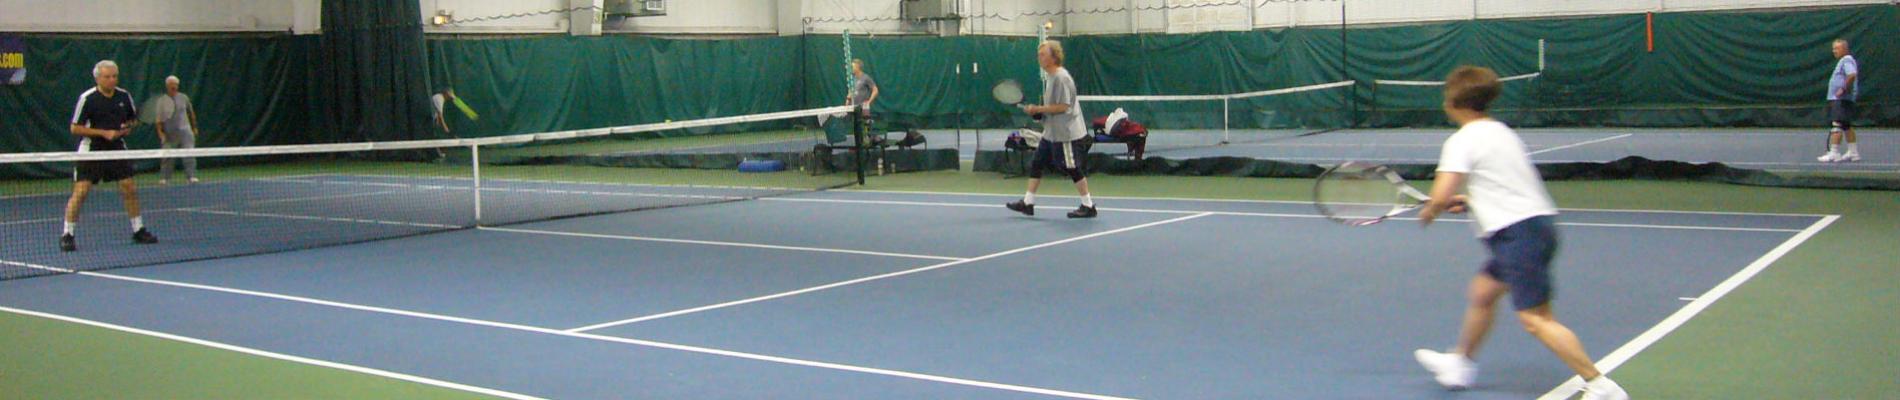 Tennis League – Mixed Doubles